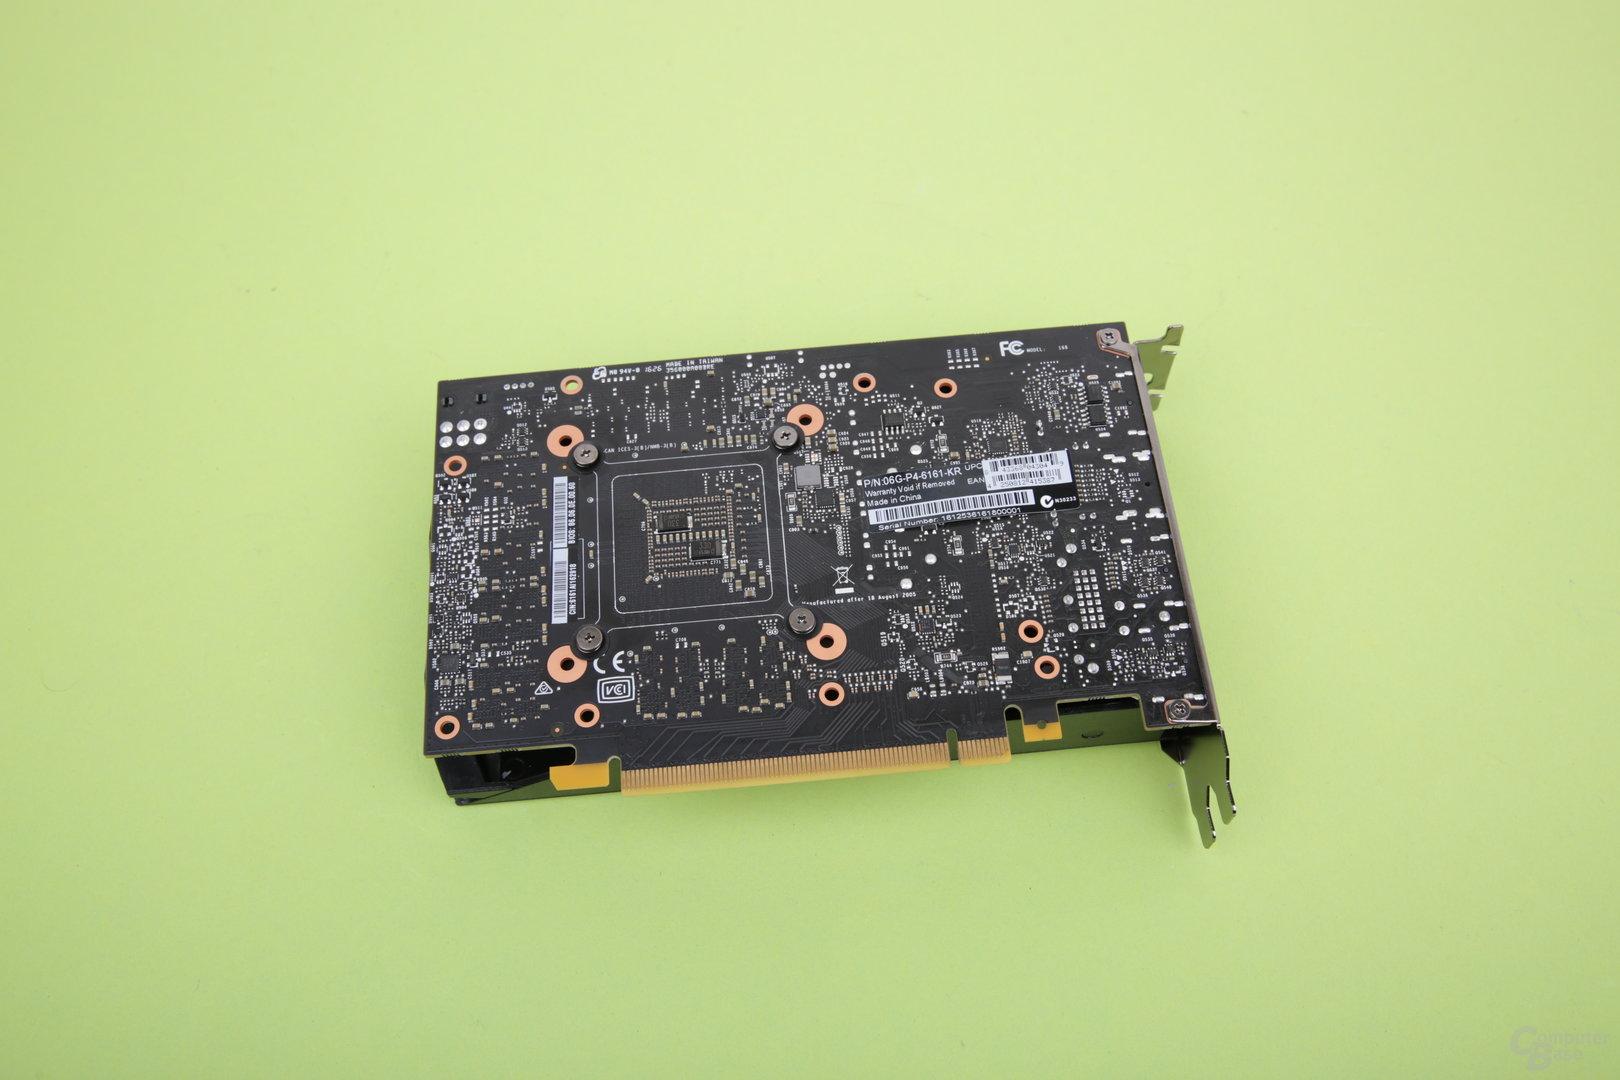 EVGA GeForce GTX 1060